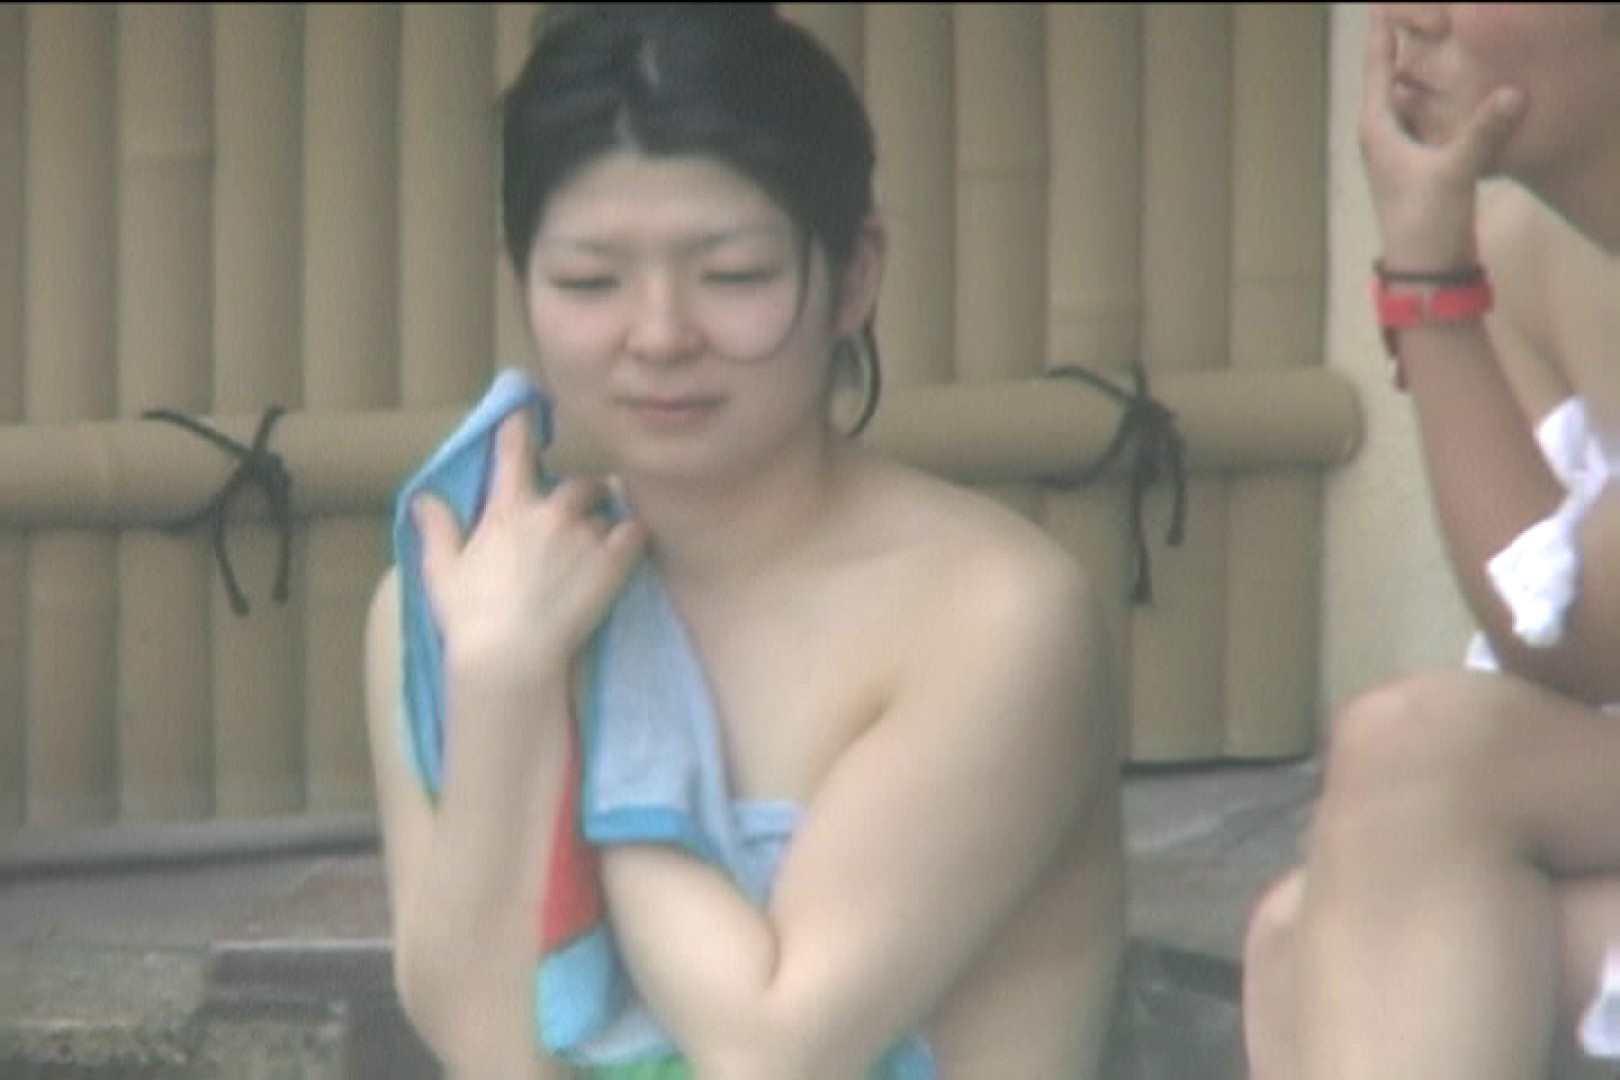 Aquaな露天風呂Vol.139 盗撮 | HなOL  53pic 50